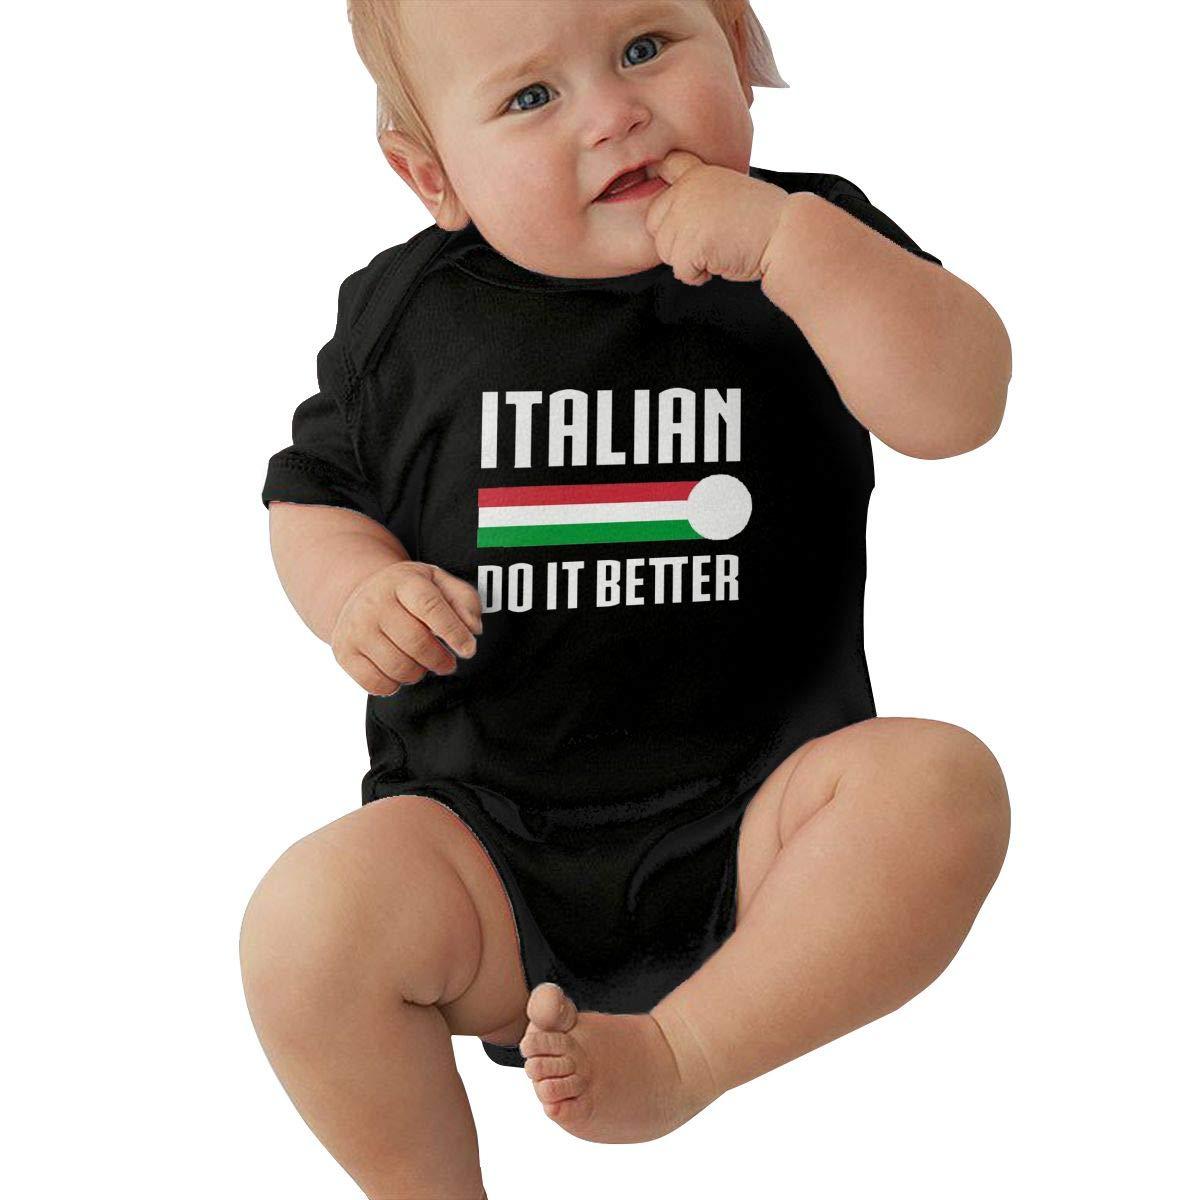 Newborn Baby Girl Boy Italians Do It Better Soccer OutfitsRomper Jumpsuit Short Sleeved Bodysuit Tops Clothes